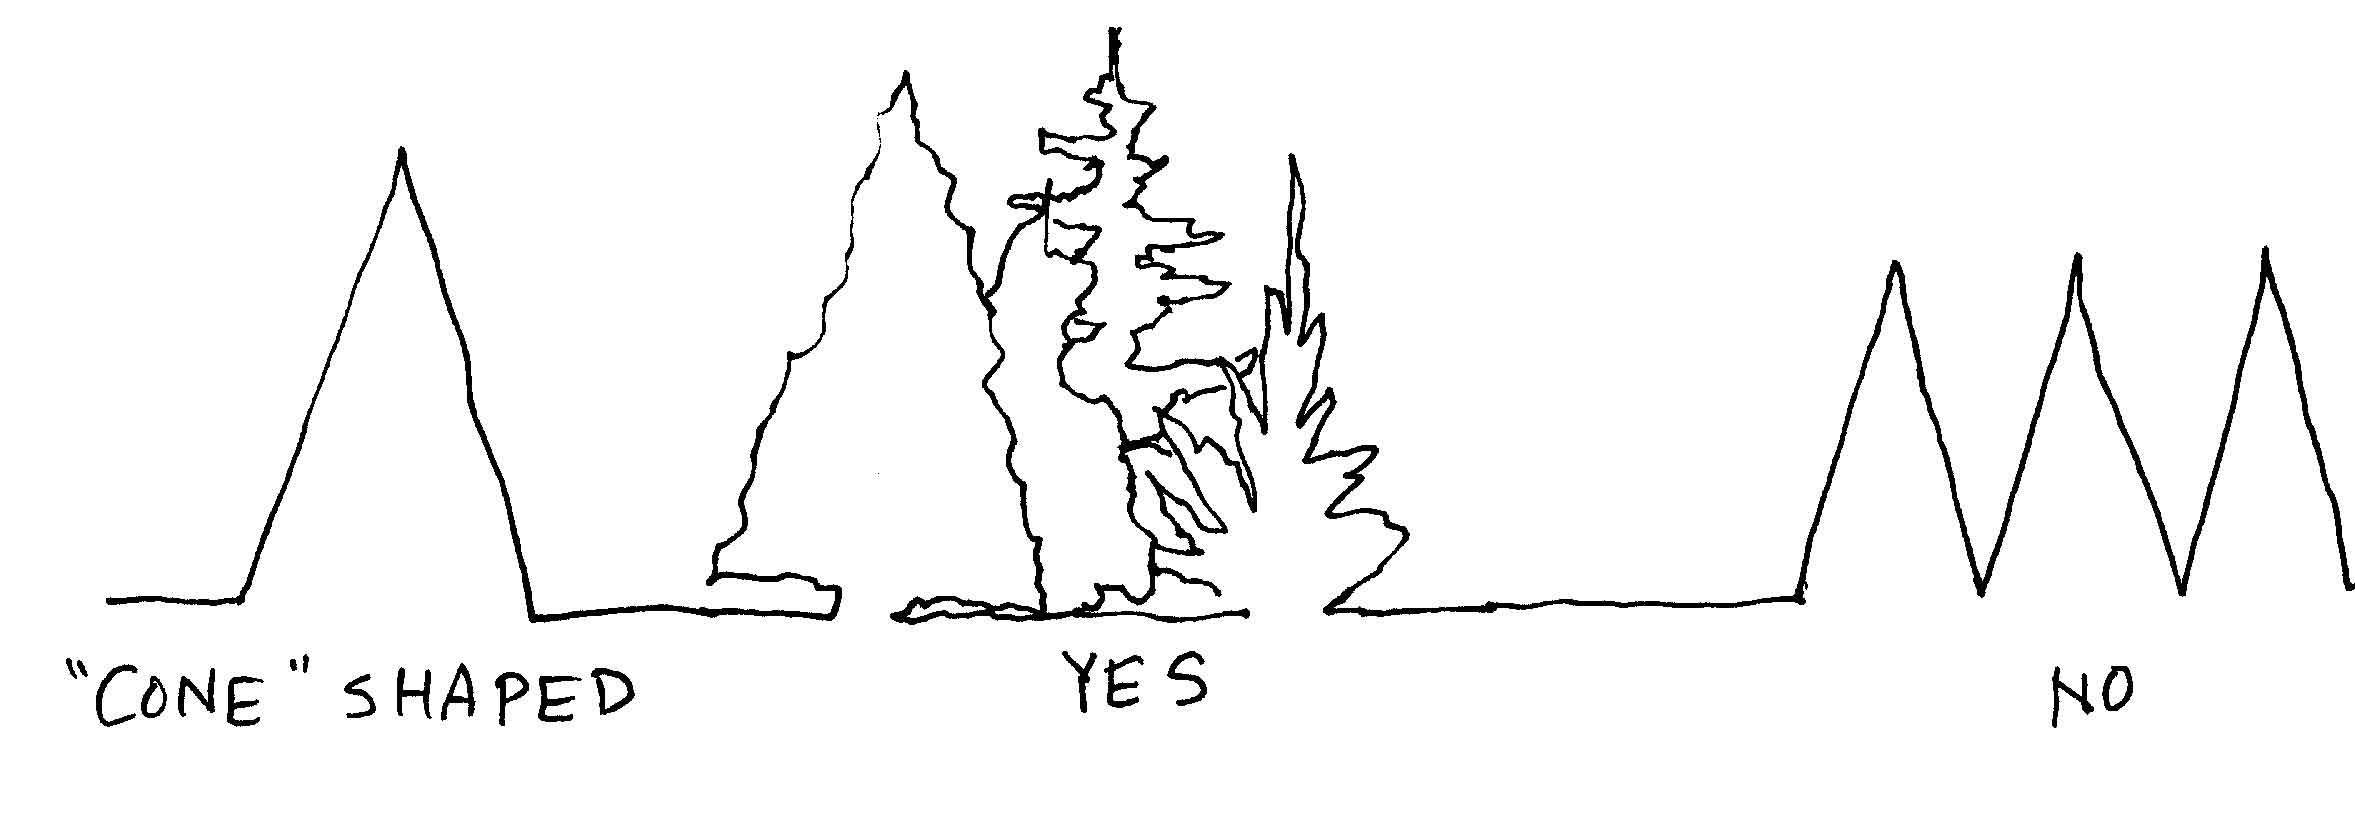 trees-cone